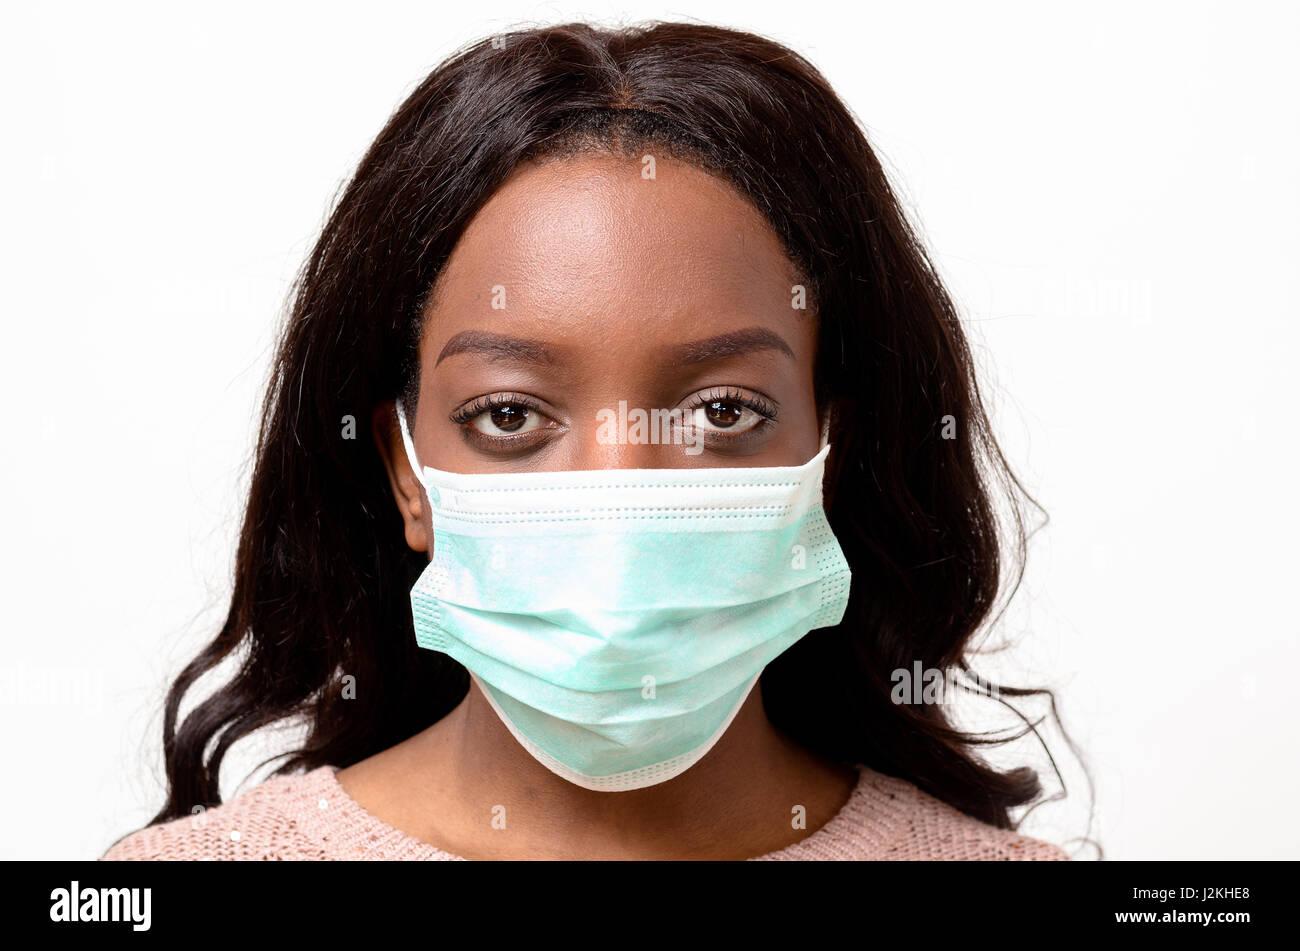 maschera facciale chirurgica